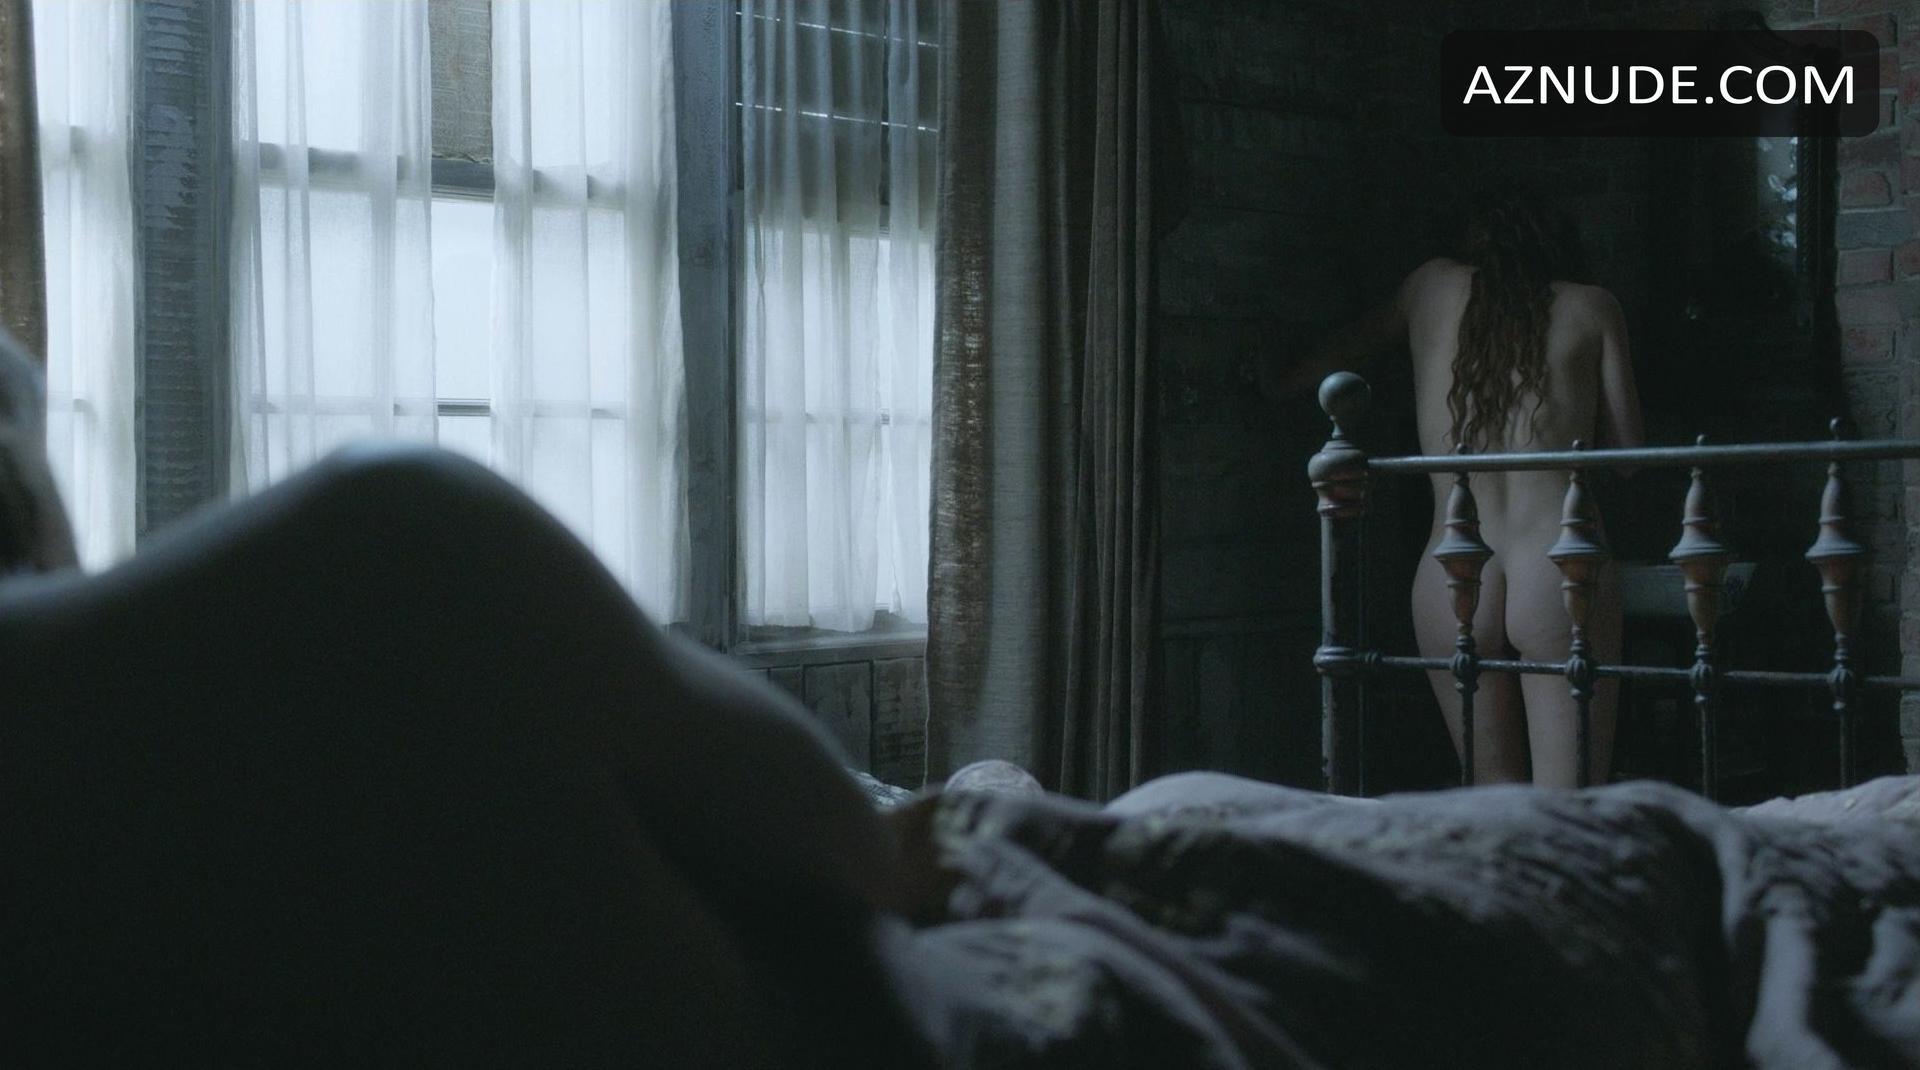 Billie piper nude penny dreadful